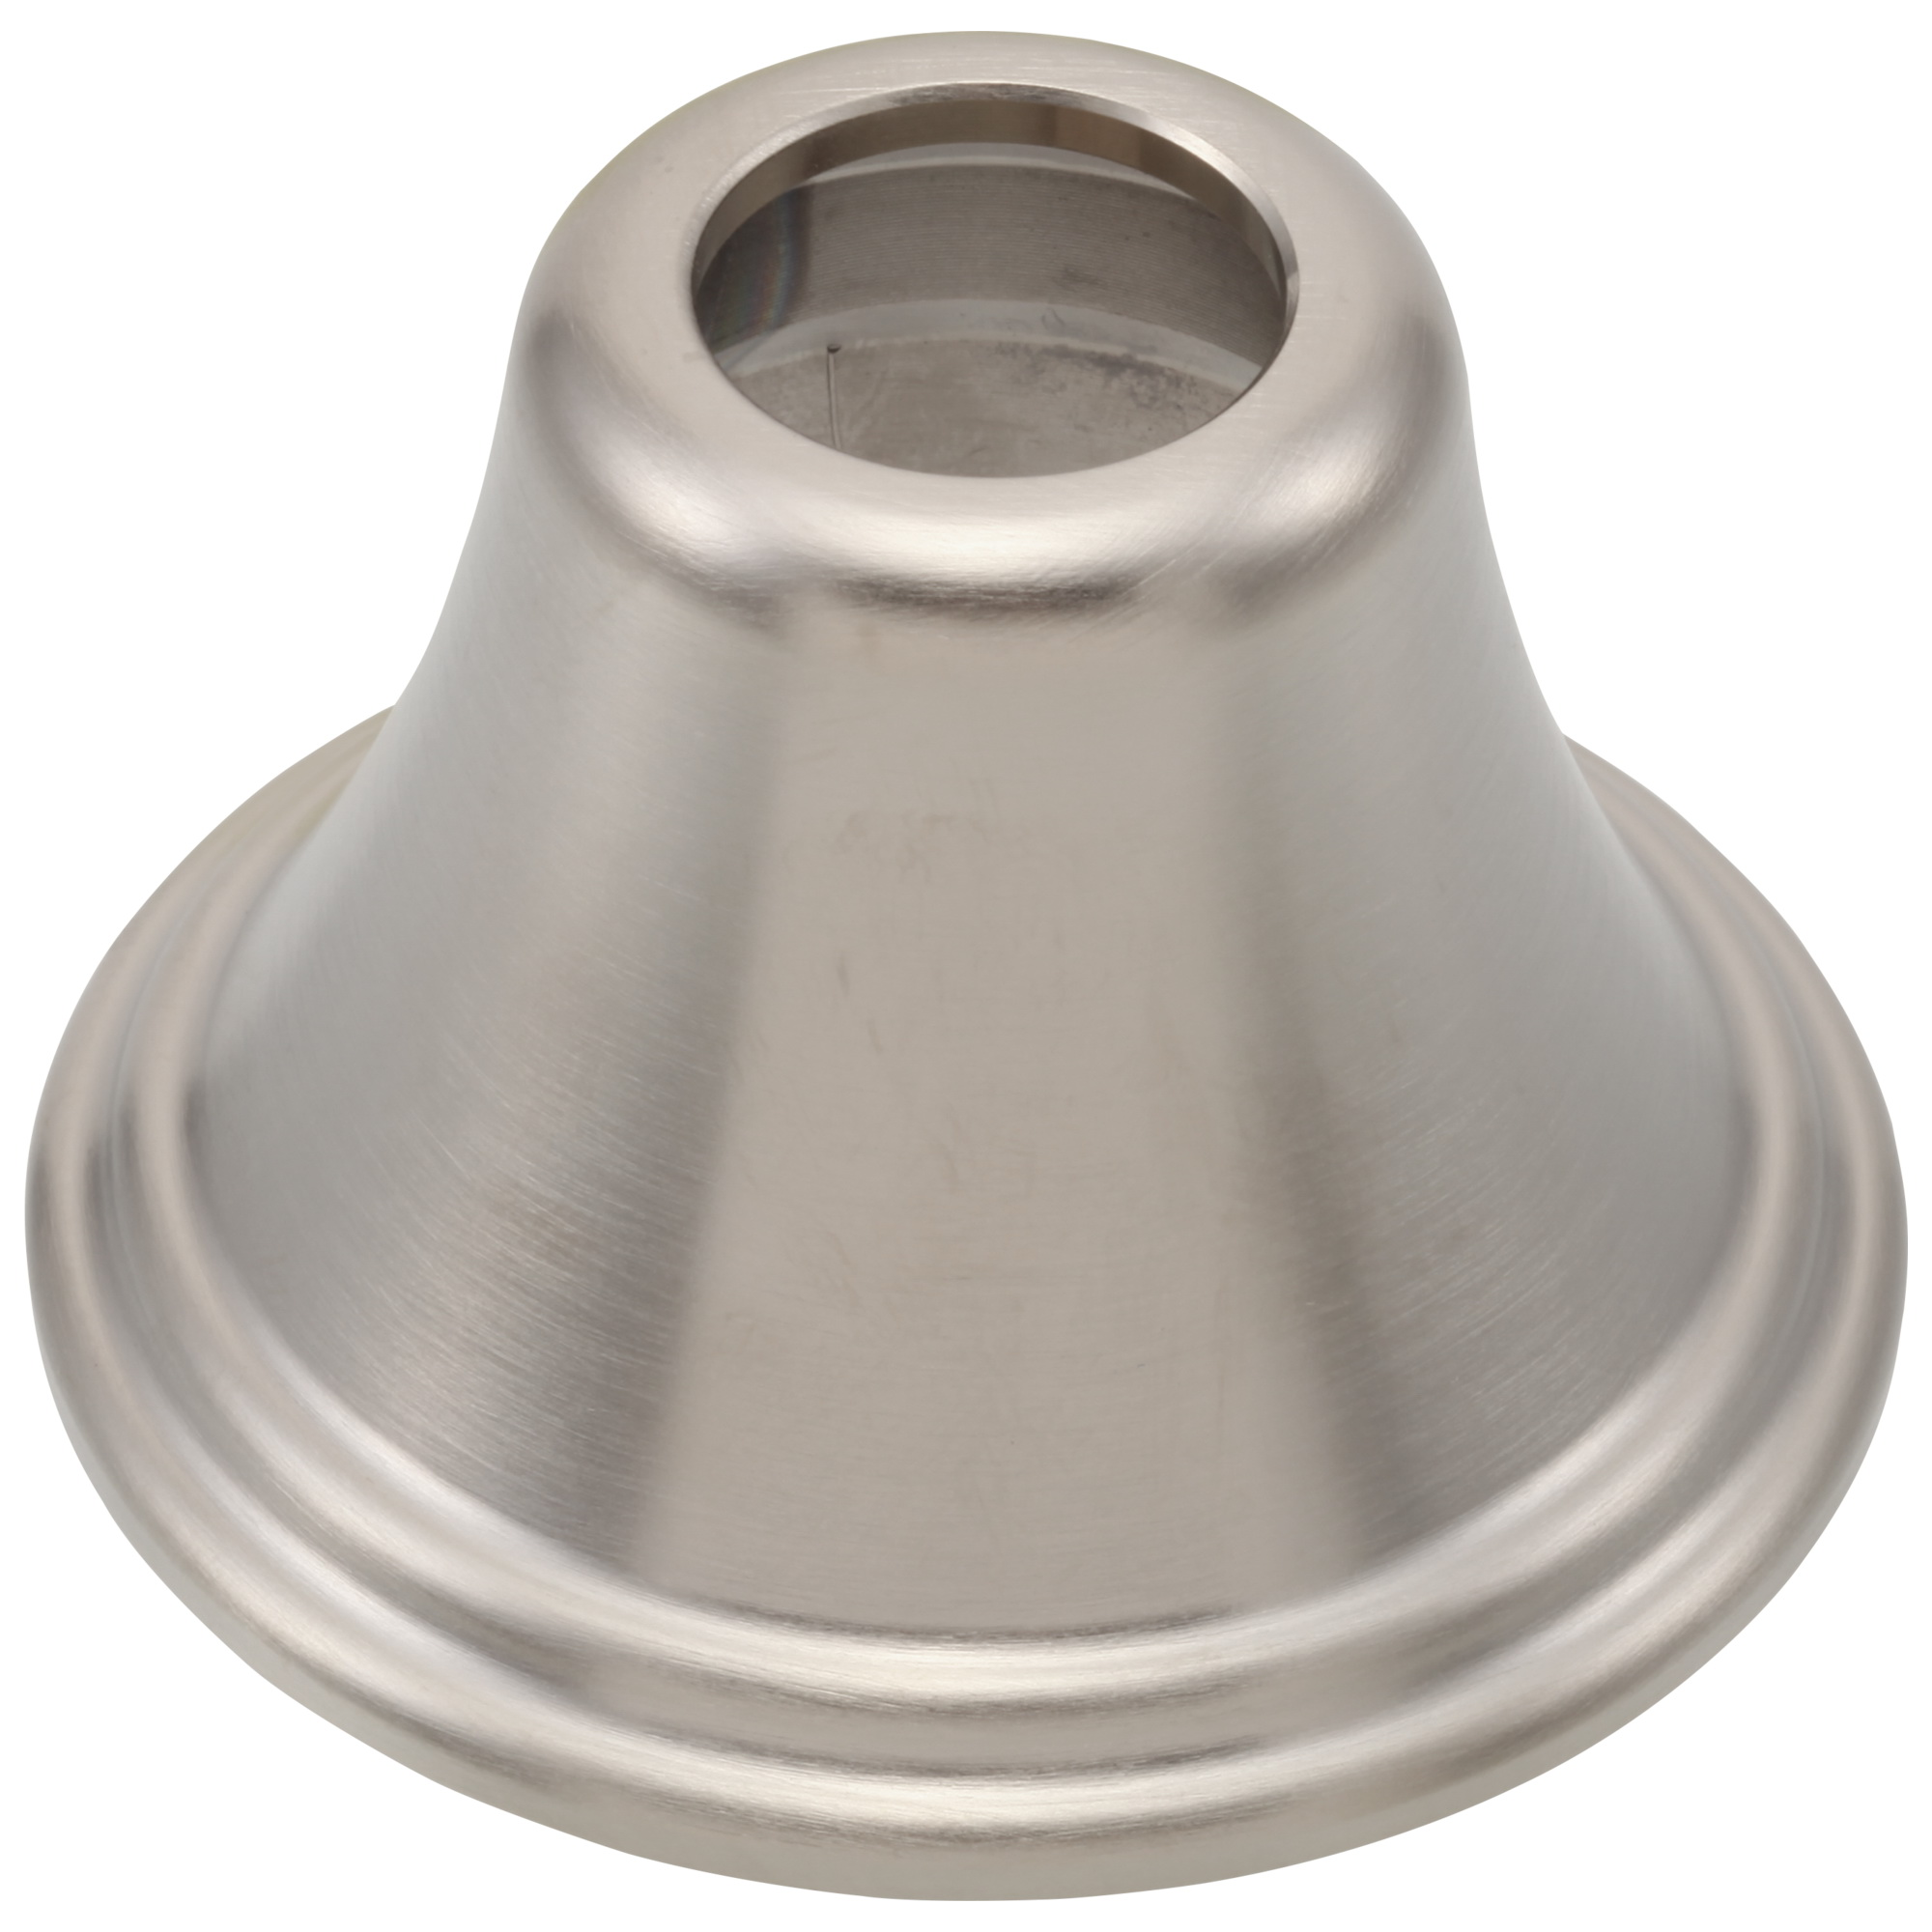 Brizo® RP37760BN Providence™ Belle™ Lavatory and Roman Tub Handle Shroud, Brushed Nickel